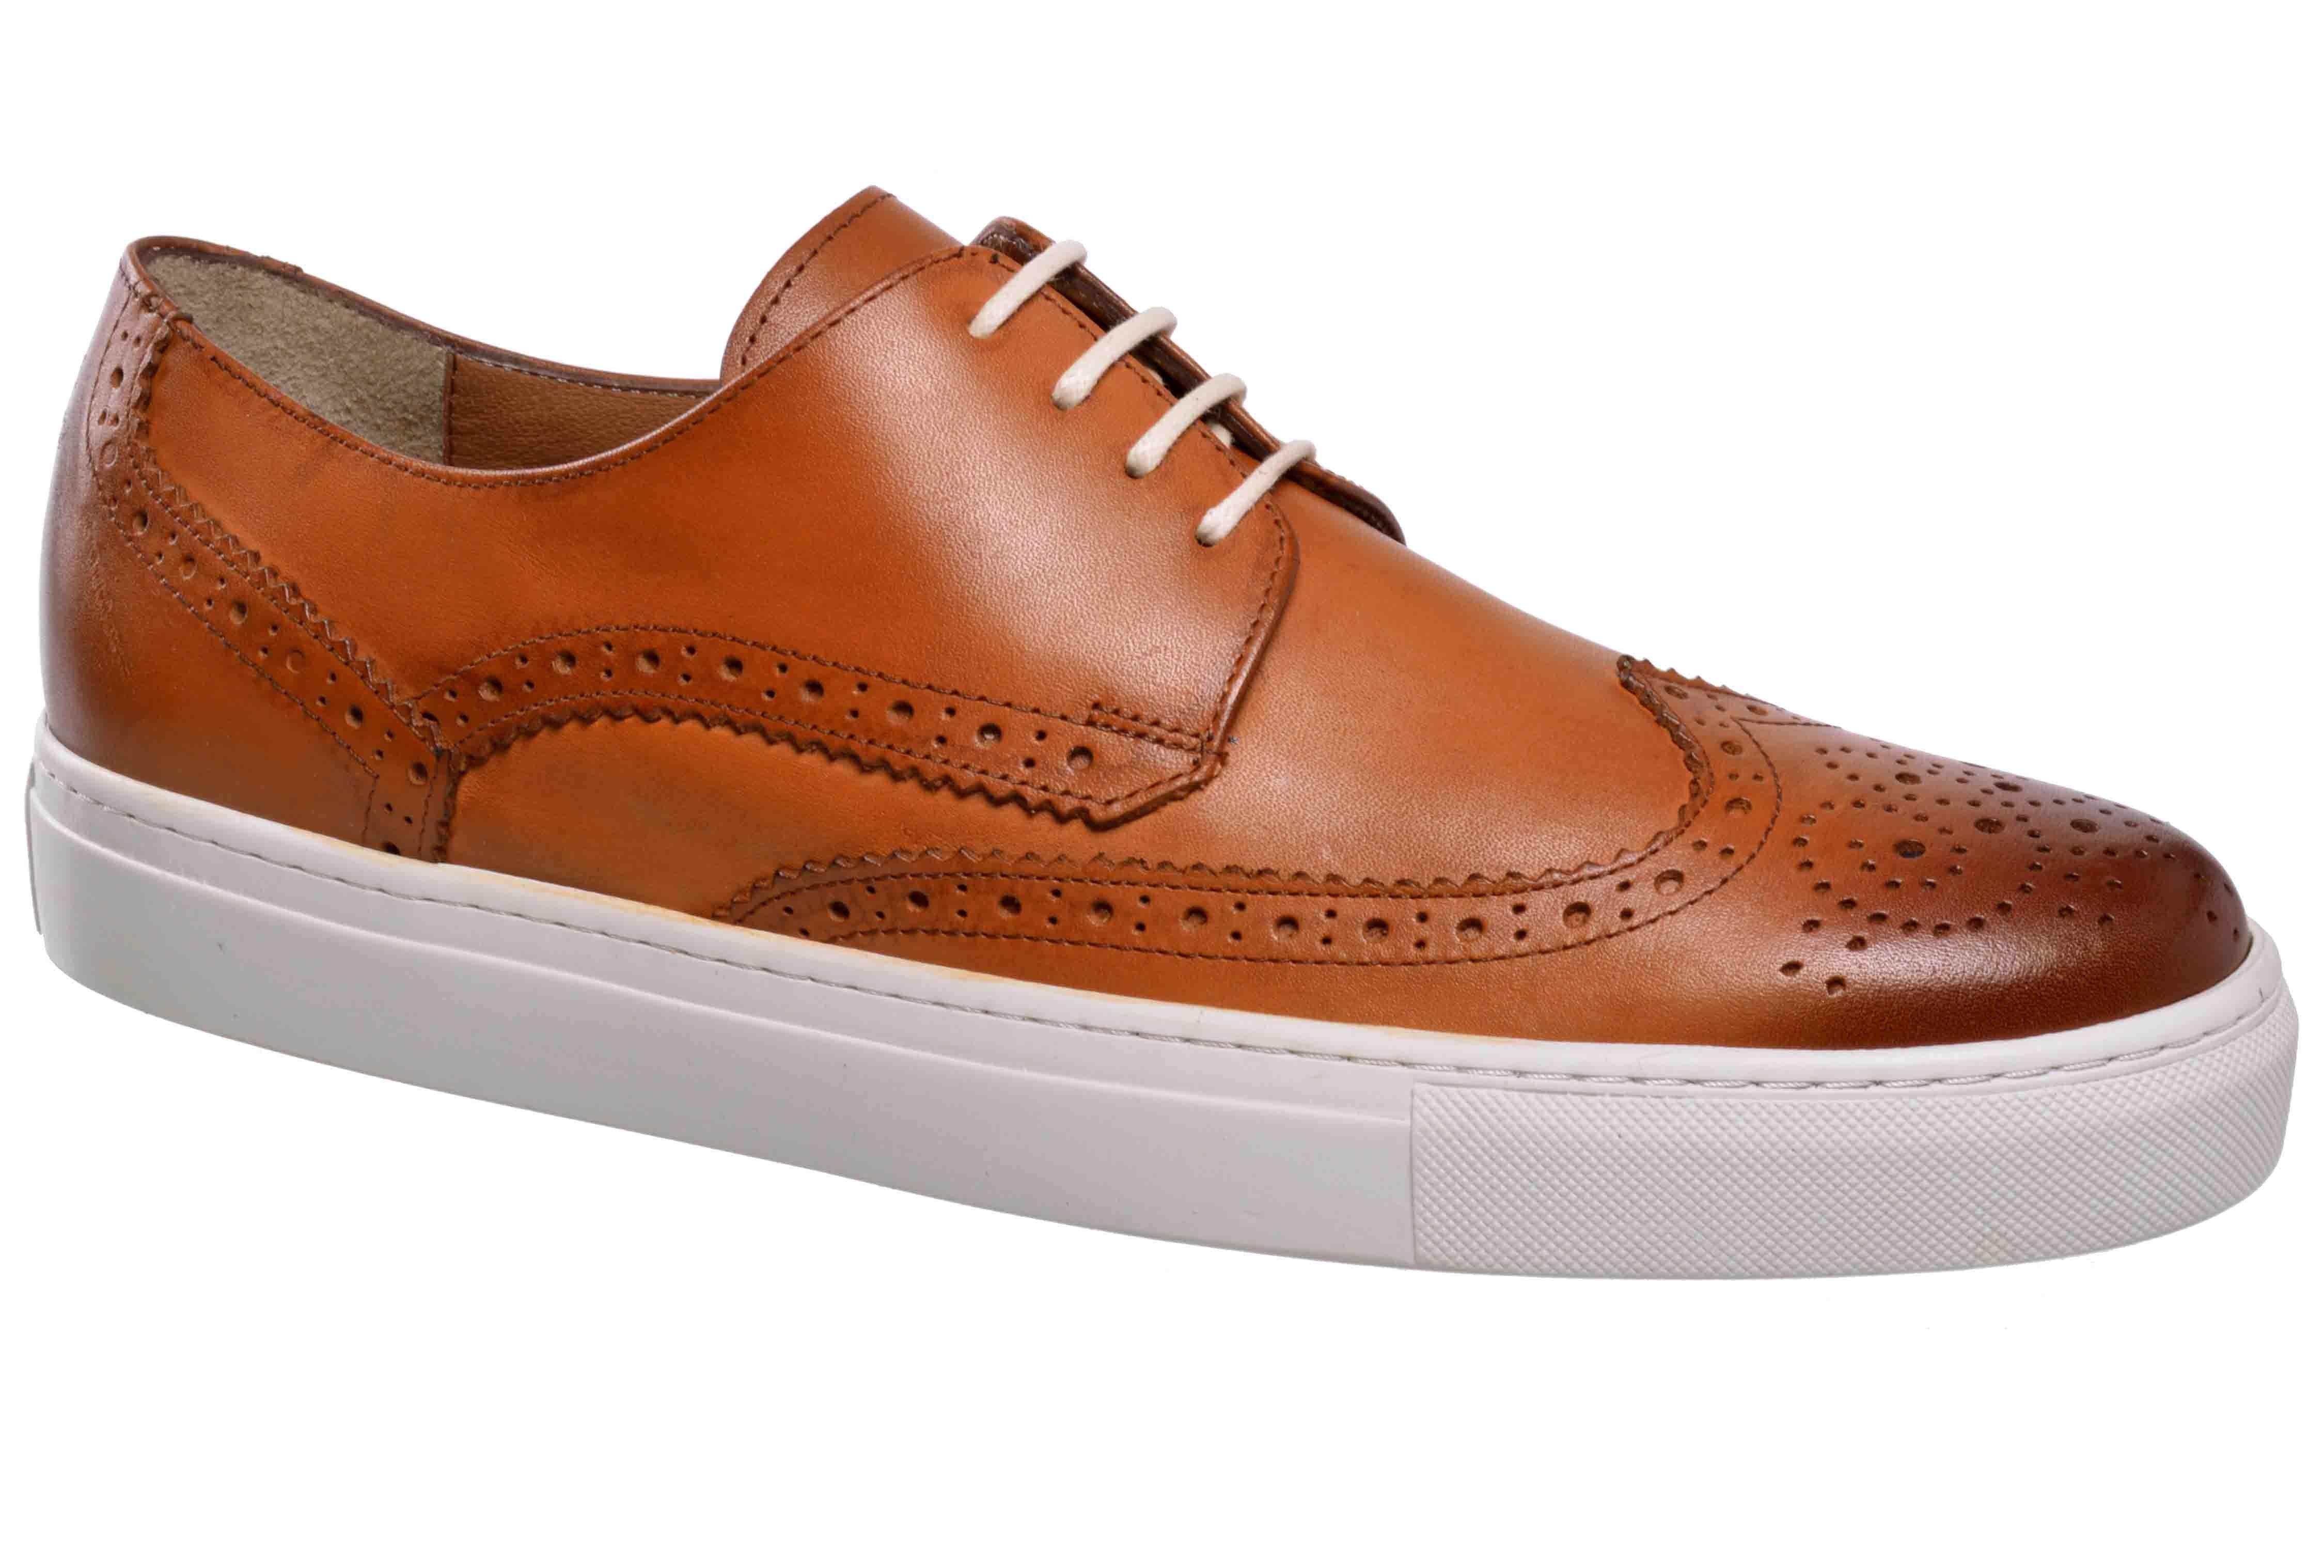 5802dac3403 Franco Fellini 7222 Ταμπα | Apostolidis Shoes